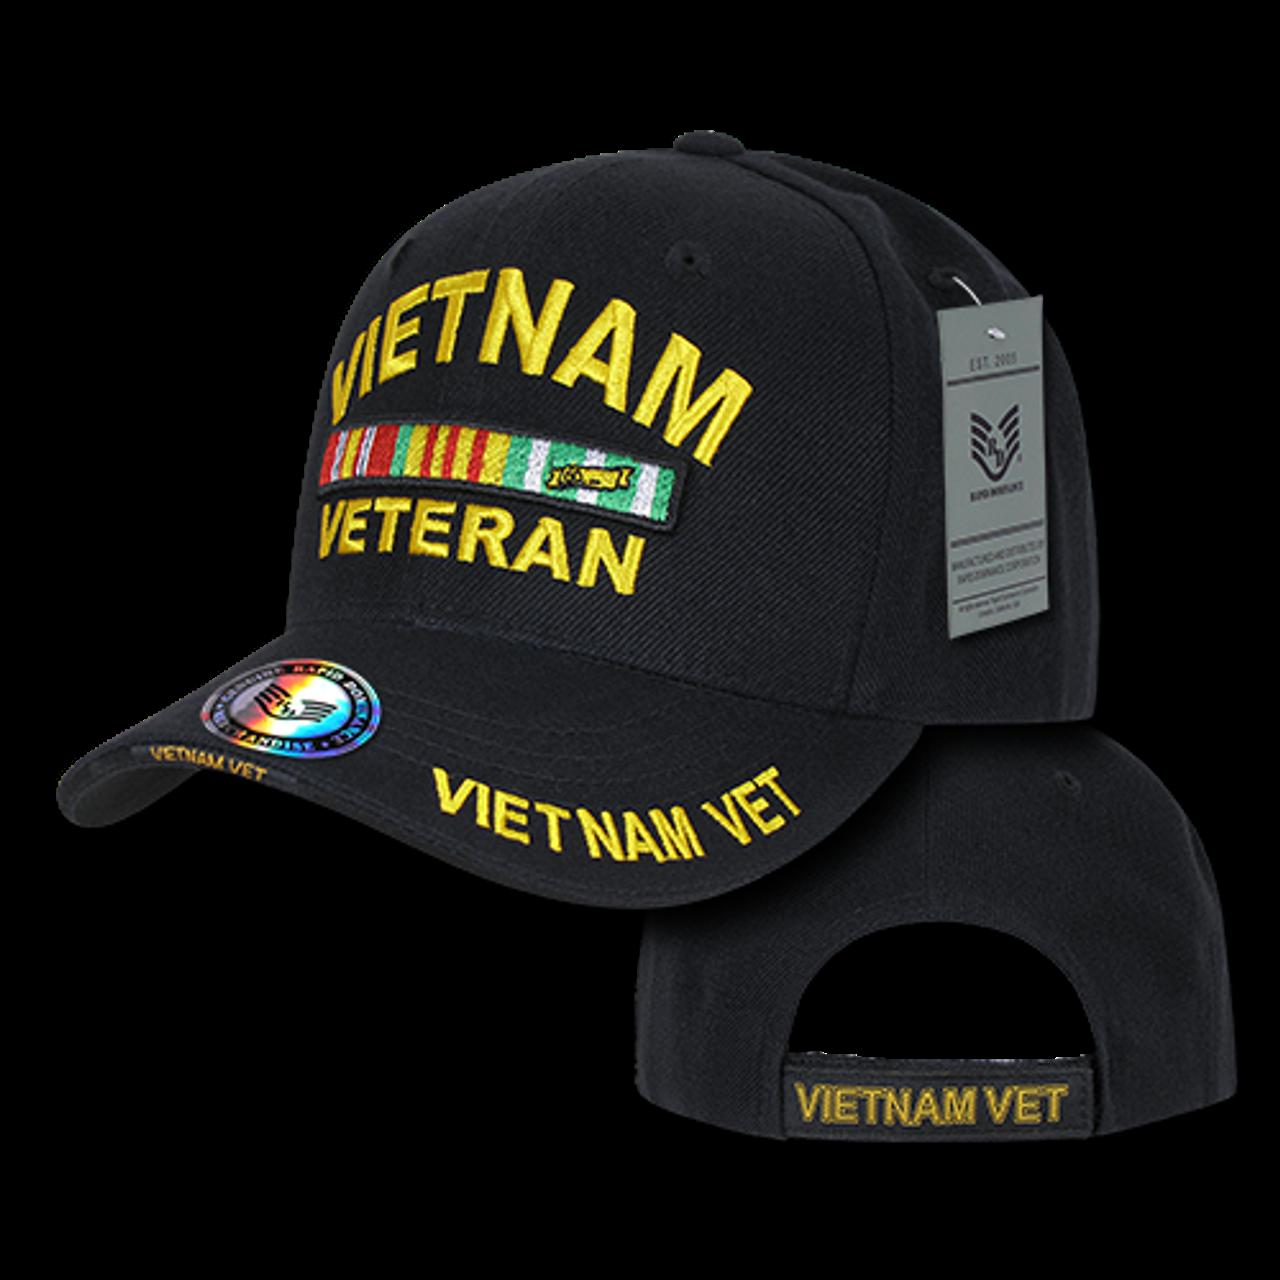 c913cbd4b S001 - Military Cap - Vietnam Veteran - Black